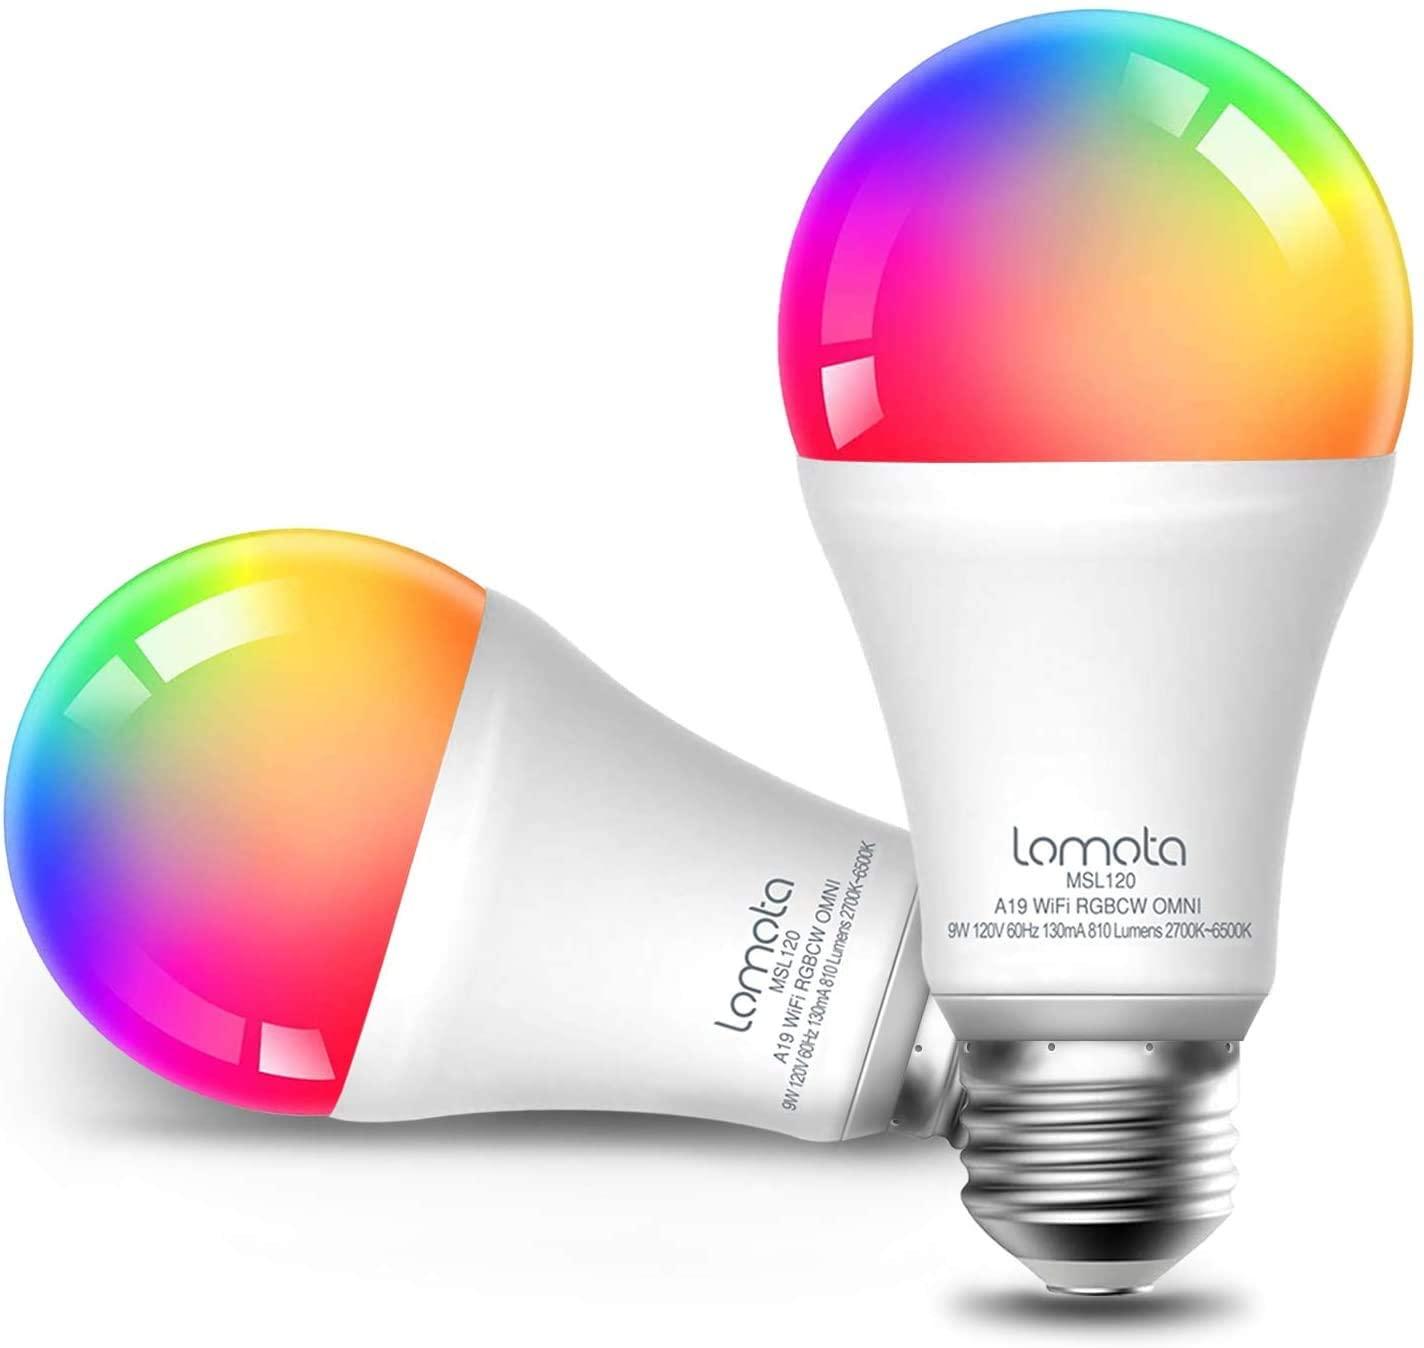 Meross Lomota Smart E27 LED lamp (800 lumen/Alexa/Google) 2 stuks voor €8 @ Amazon.nl